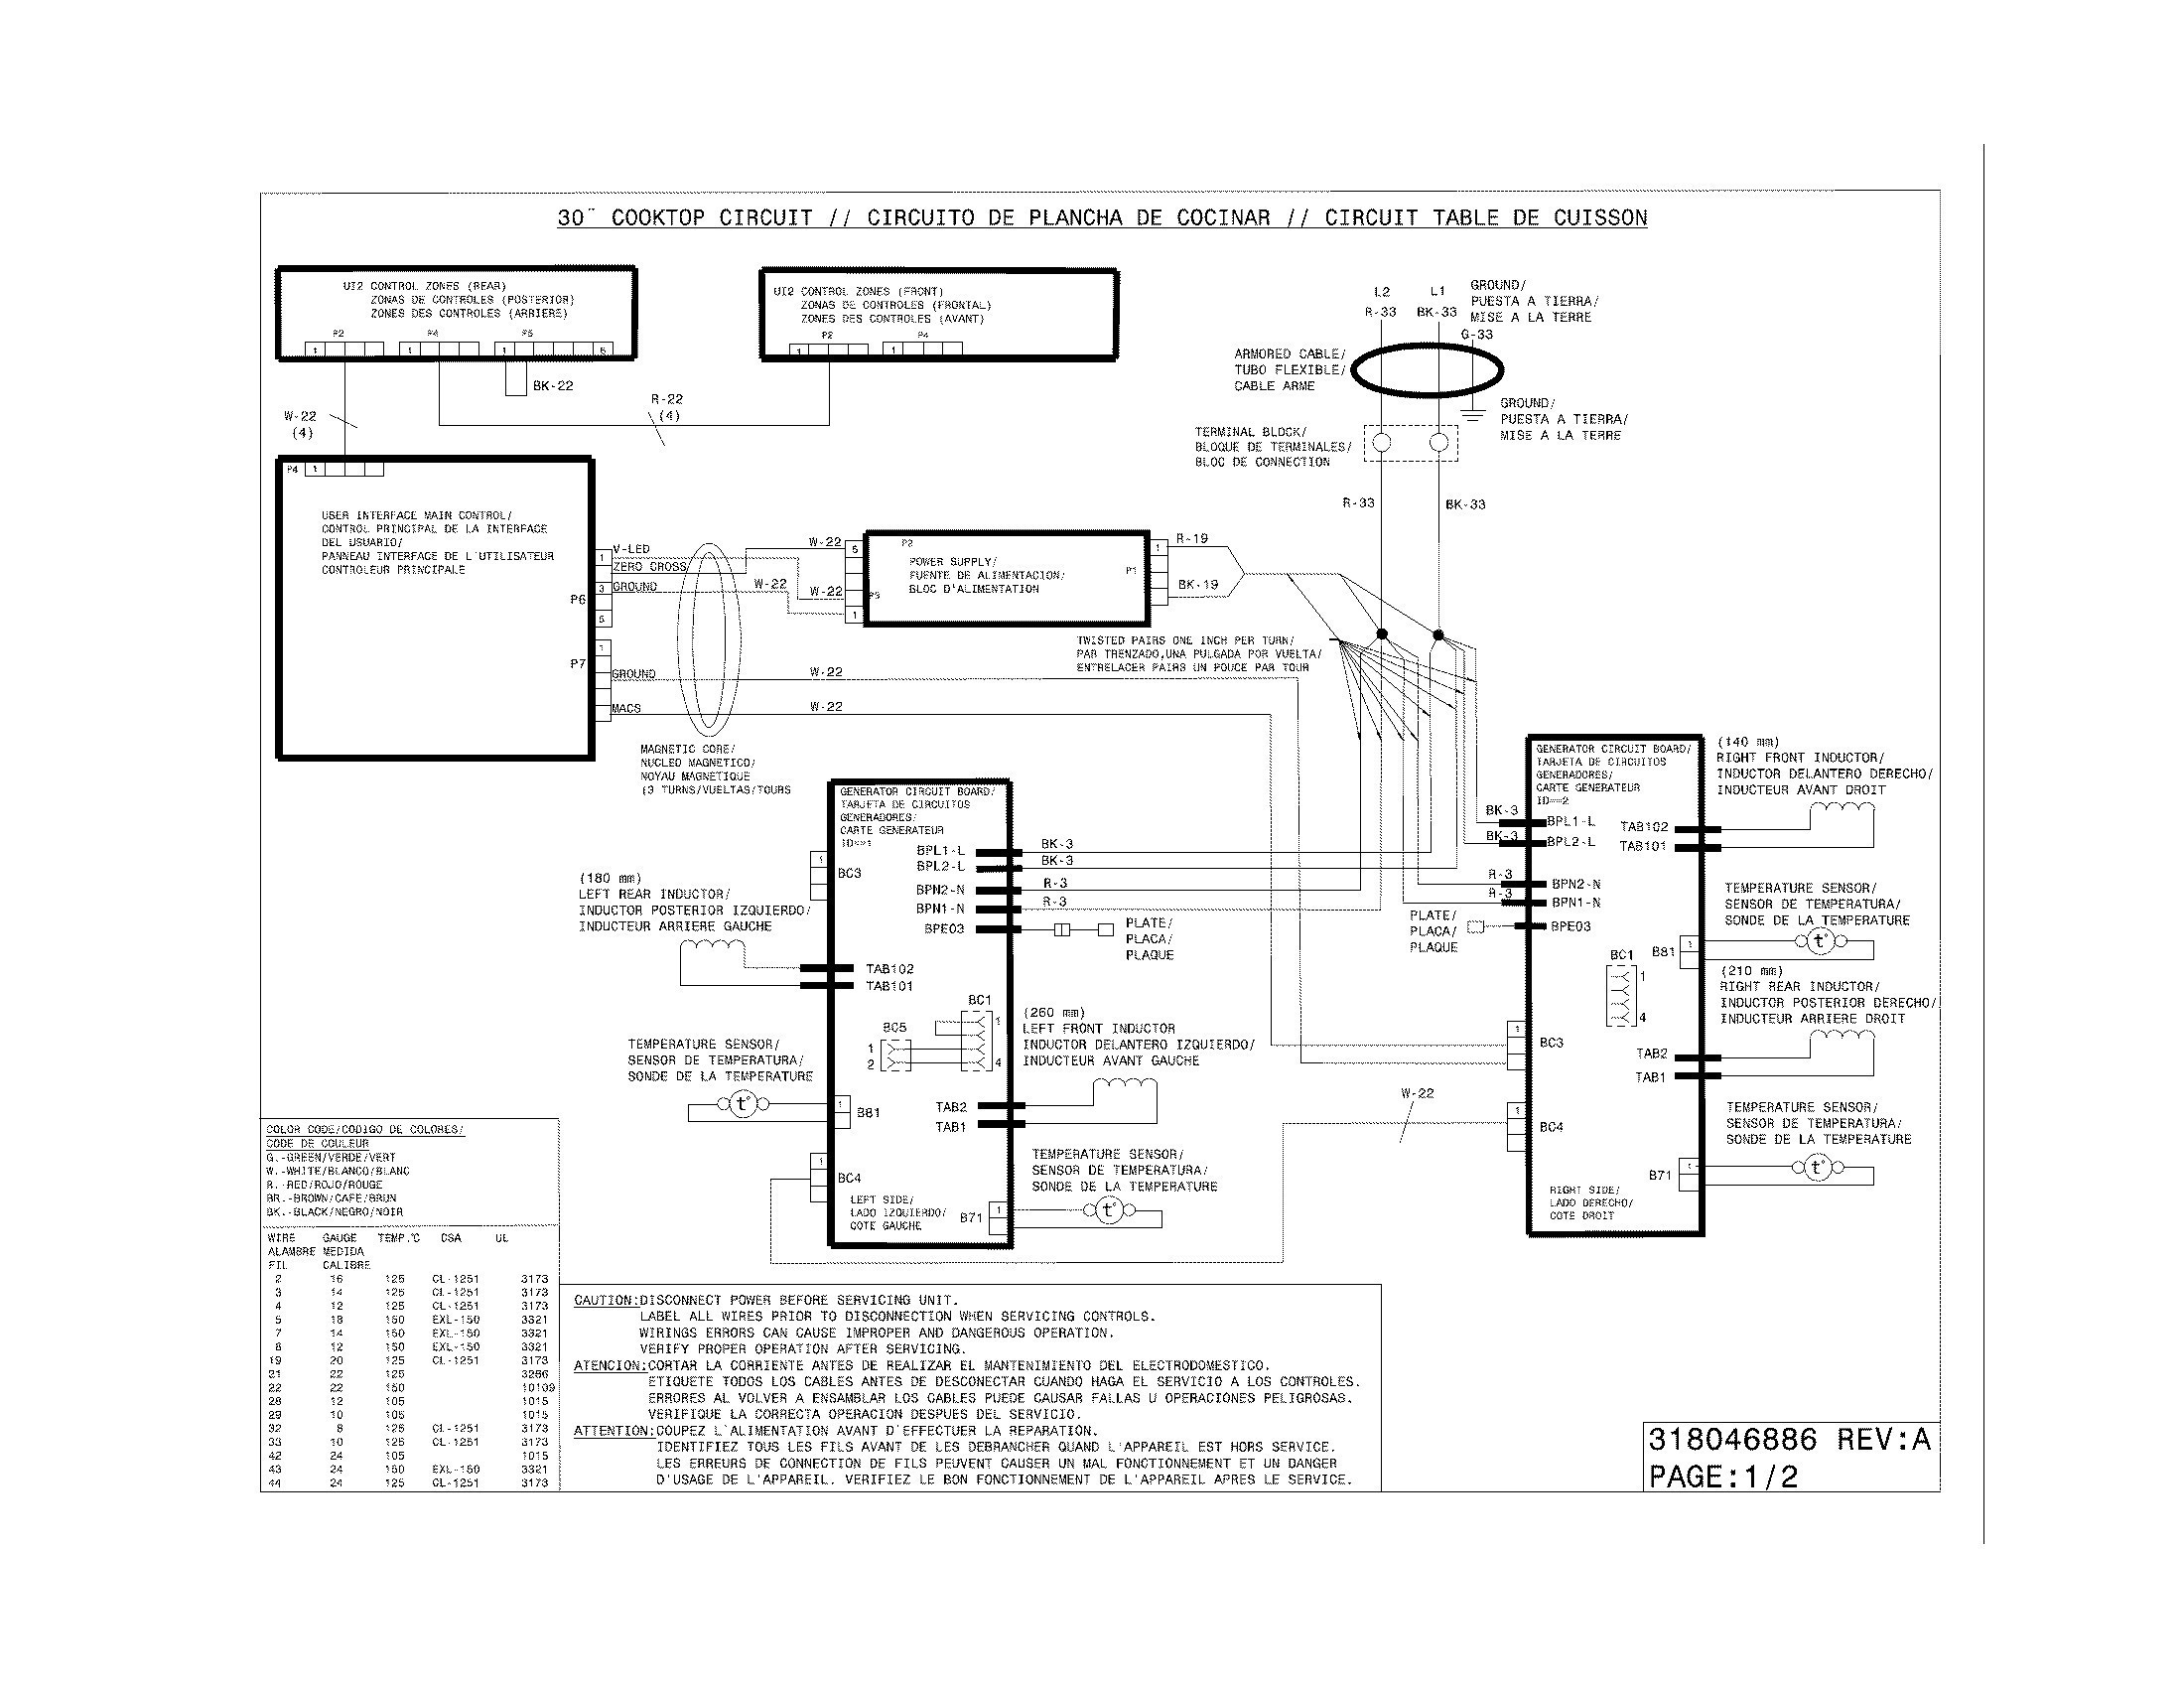 EA7 Lift Master Wiring Diagram Dj   Wiring LibraryWiring Library